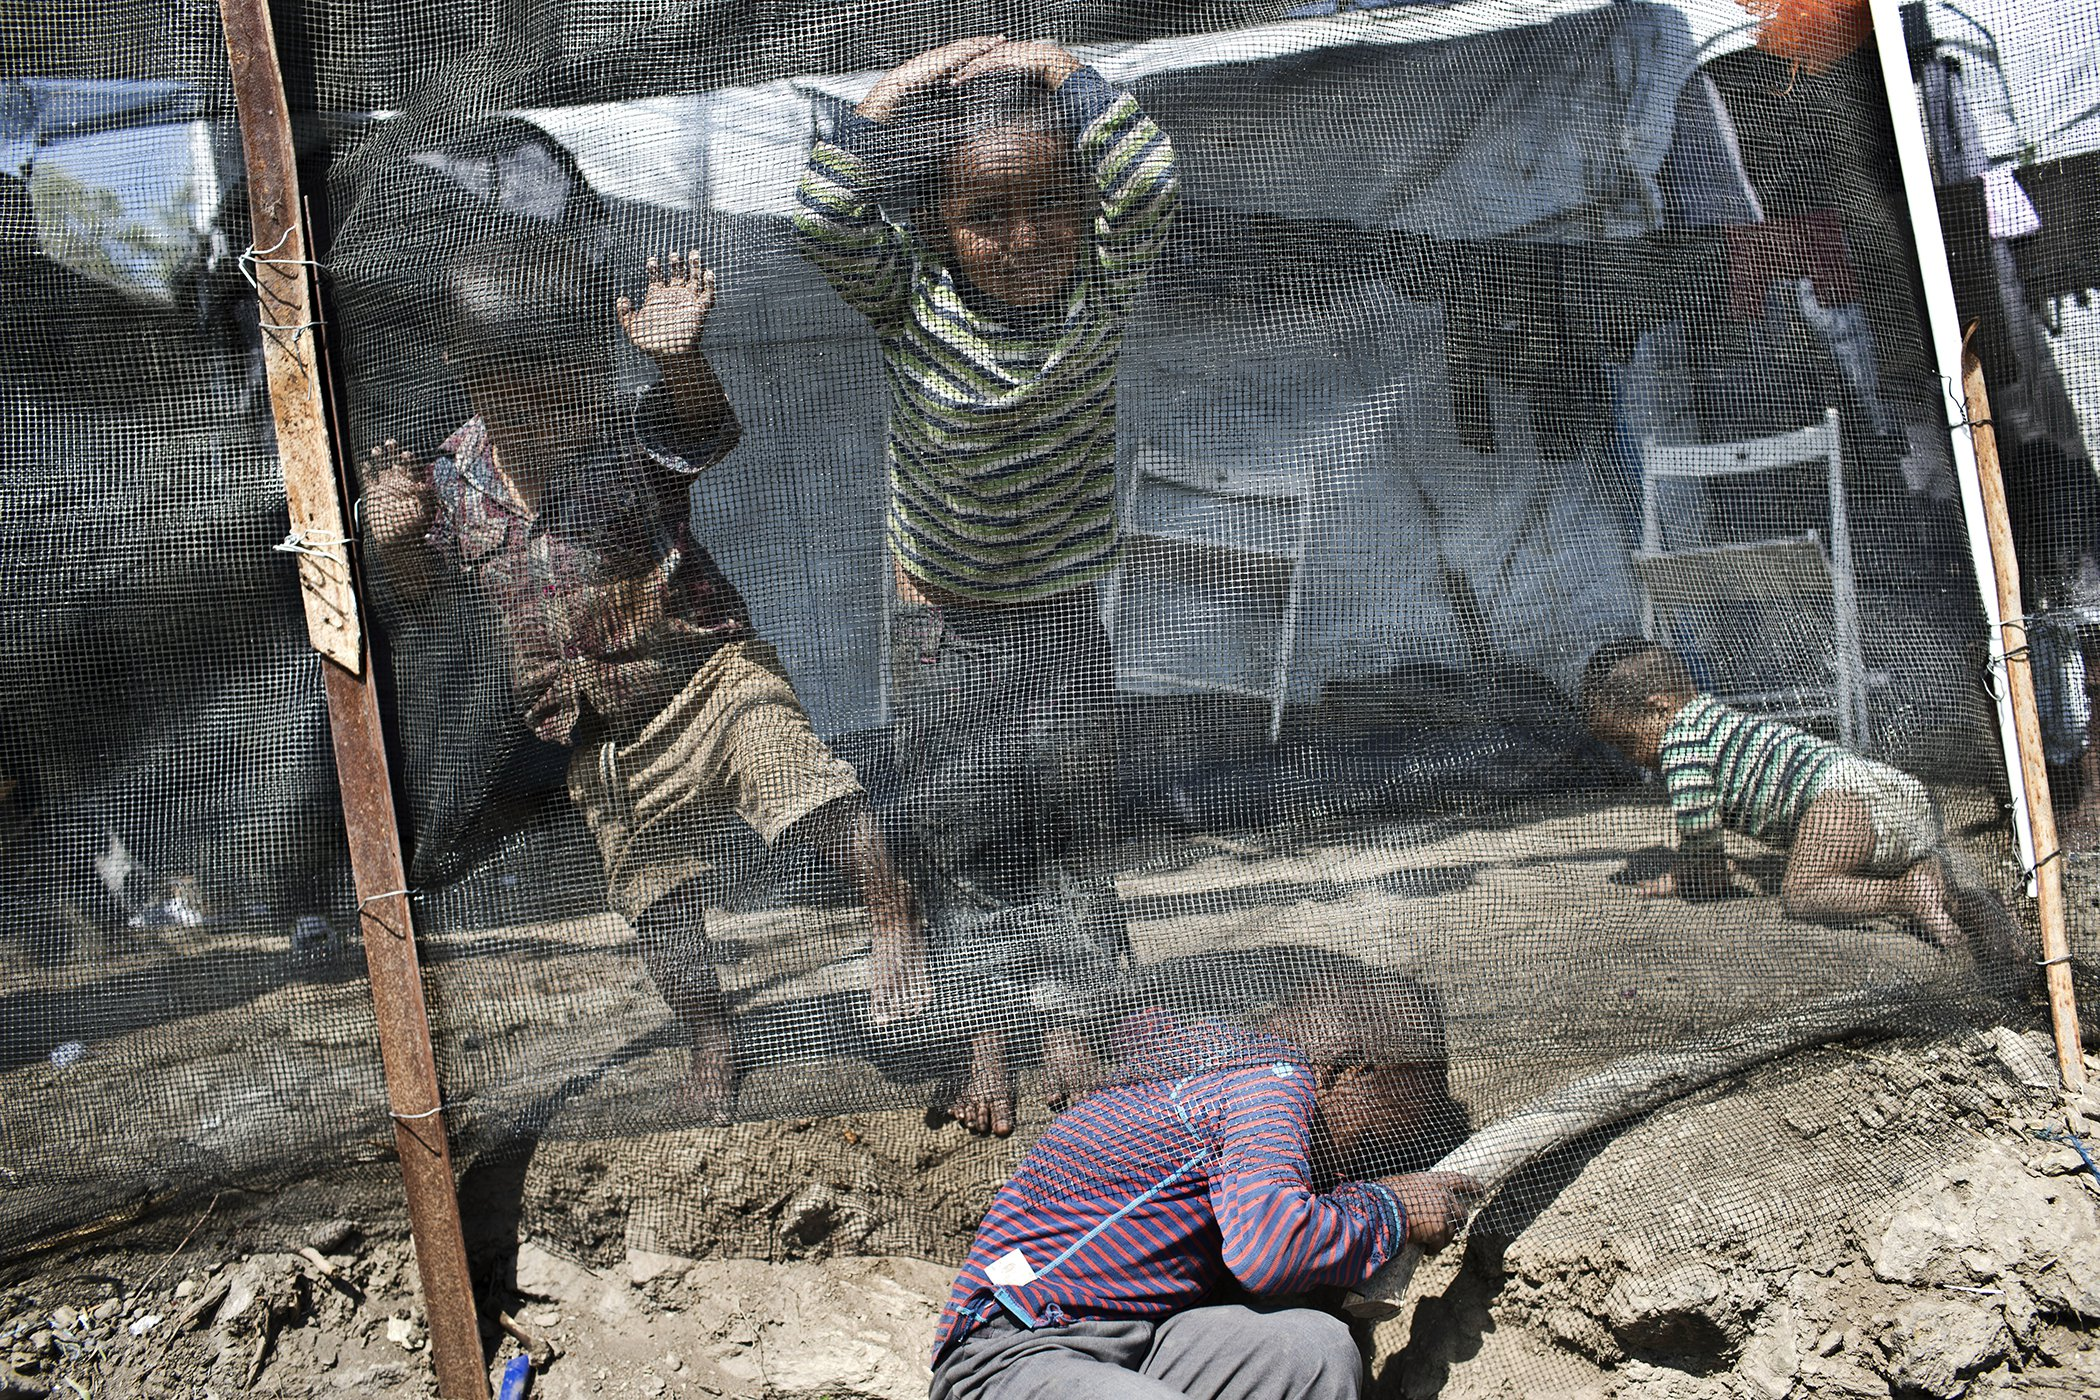 Greece-Migrants-Refugee-Camp.jpg